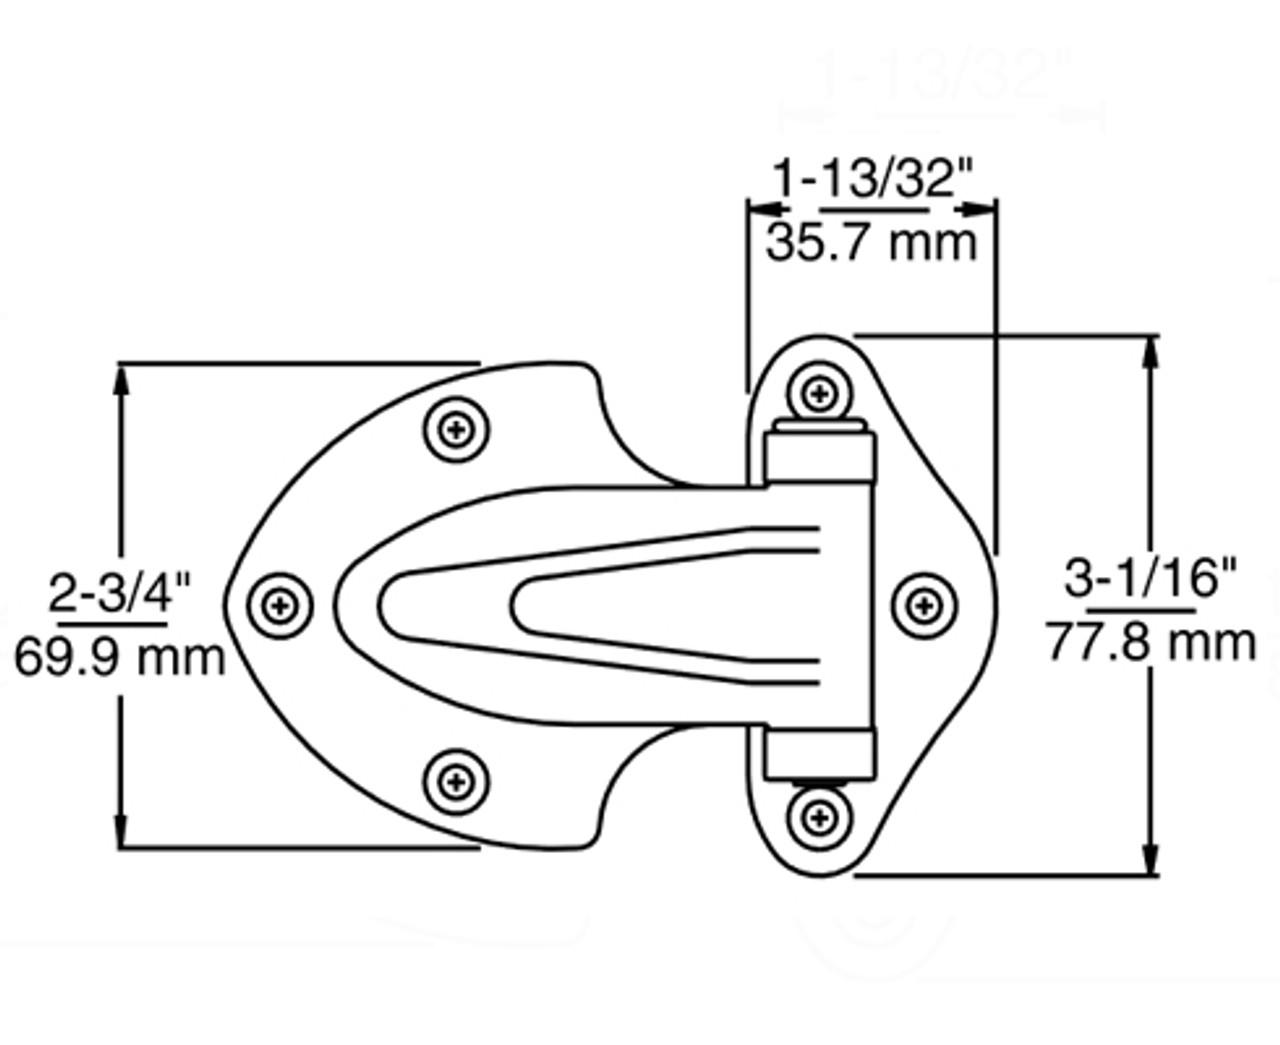 Kason-139-Narrow-flange-hinge-diagram-10139000004-10139000032-10139000040